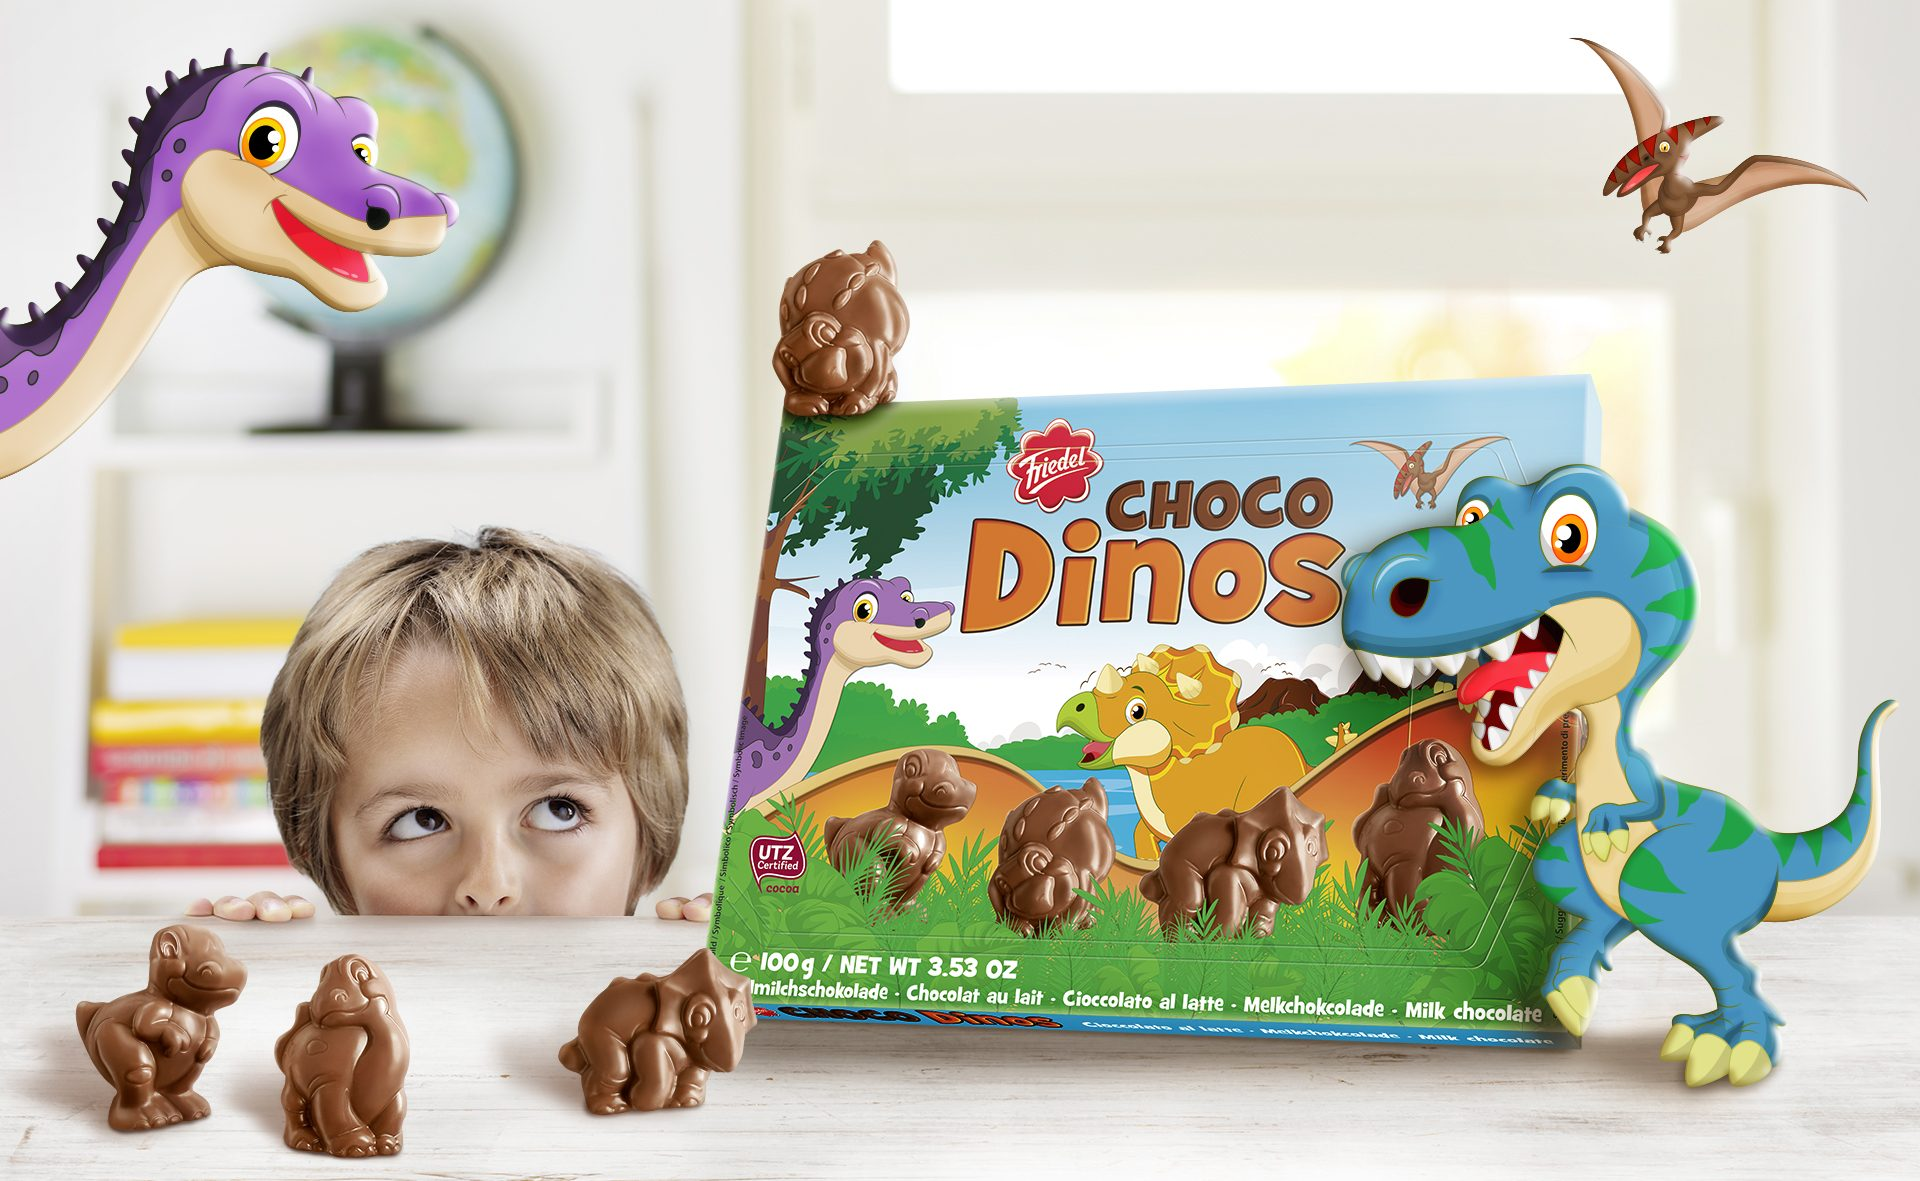 Verpackungsdesign Malvega - Referenz: Choco Dinos, Friedel